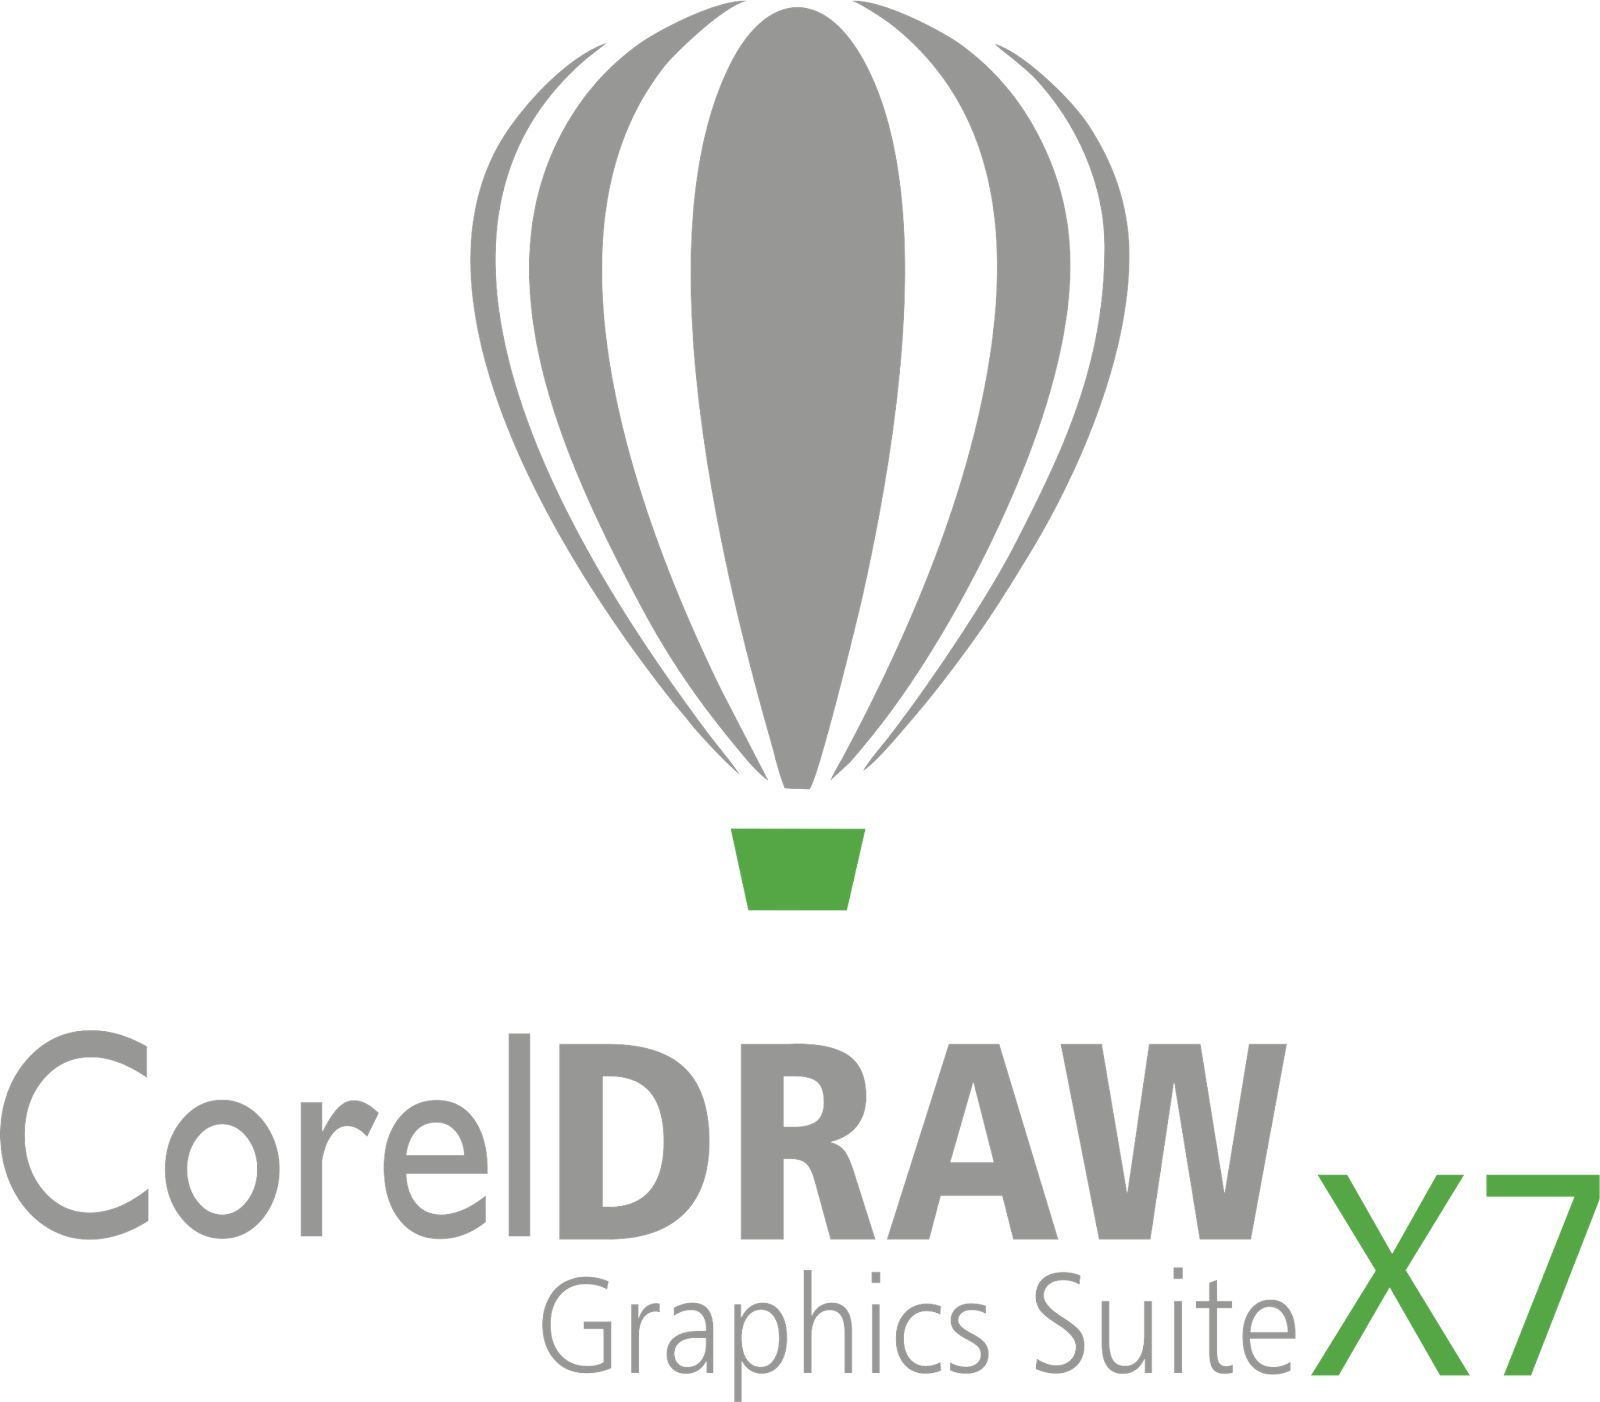 Corel Draw Graphics X7 Full Version Free Download 2017 Amit Tech Hindi